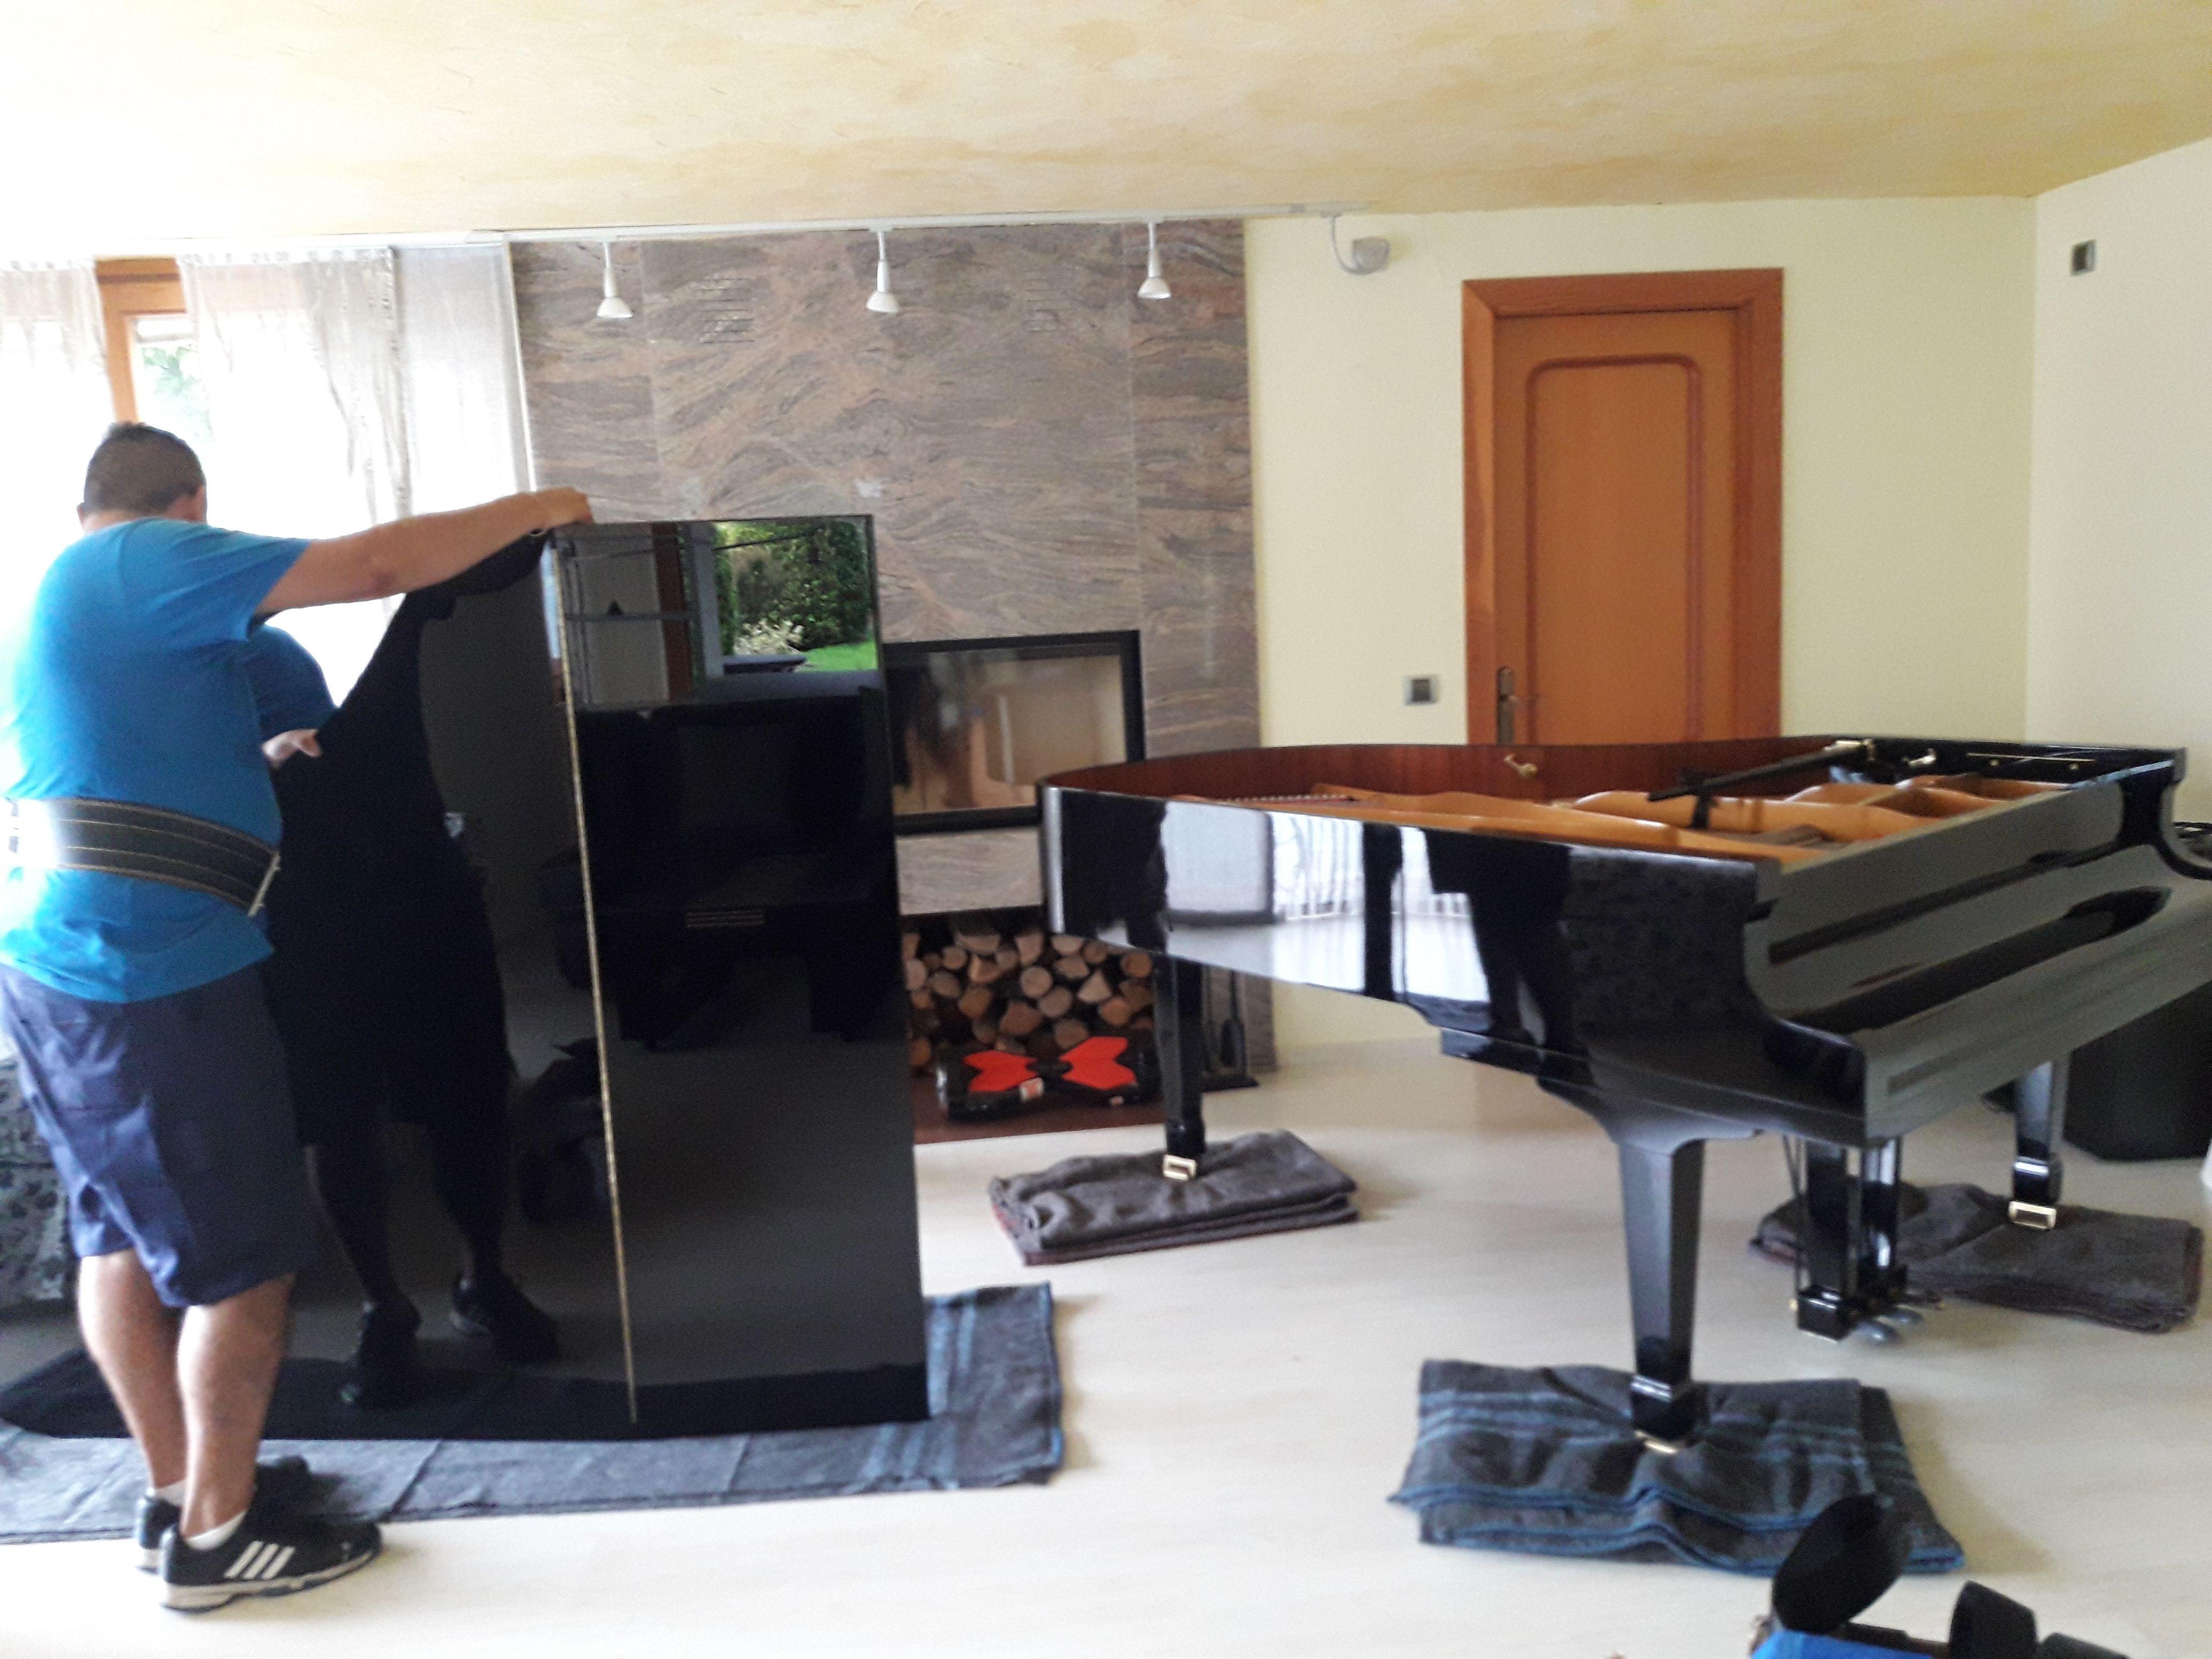 Mudanzas de pianos: Catálogo de Transportes Peña